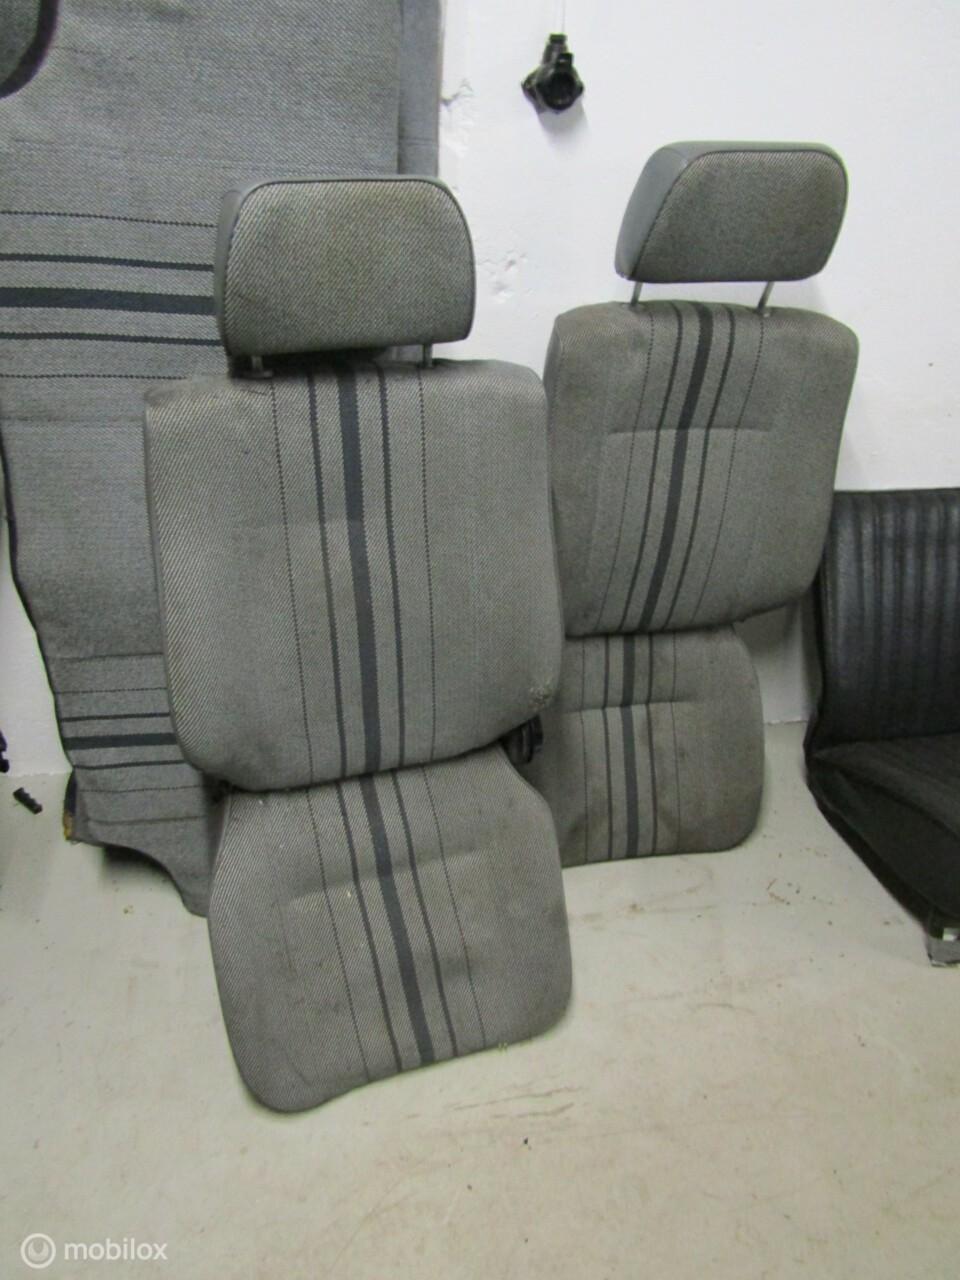 Opel Manta B Interieur  2x stoel + bank en panelen '75-'90